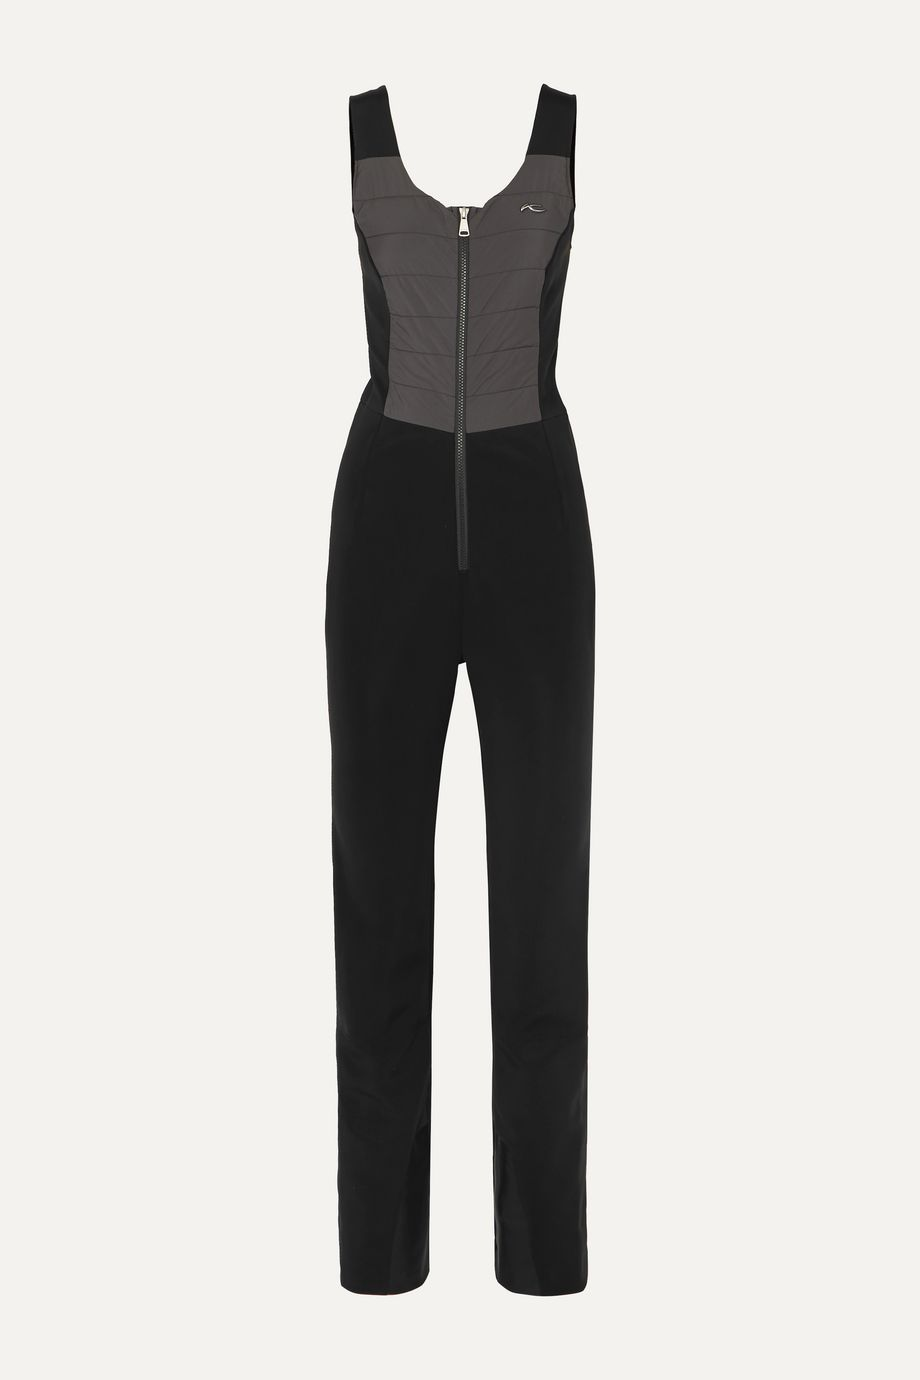 Kjus Varuna stretch ski suit